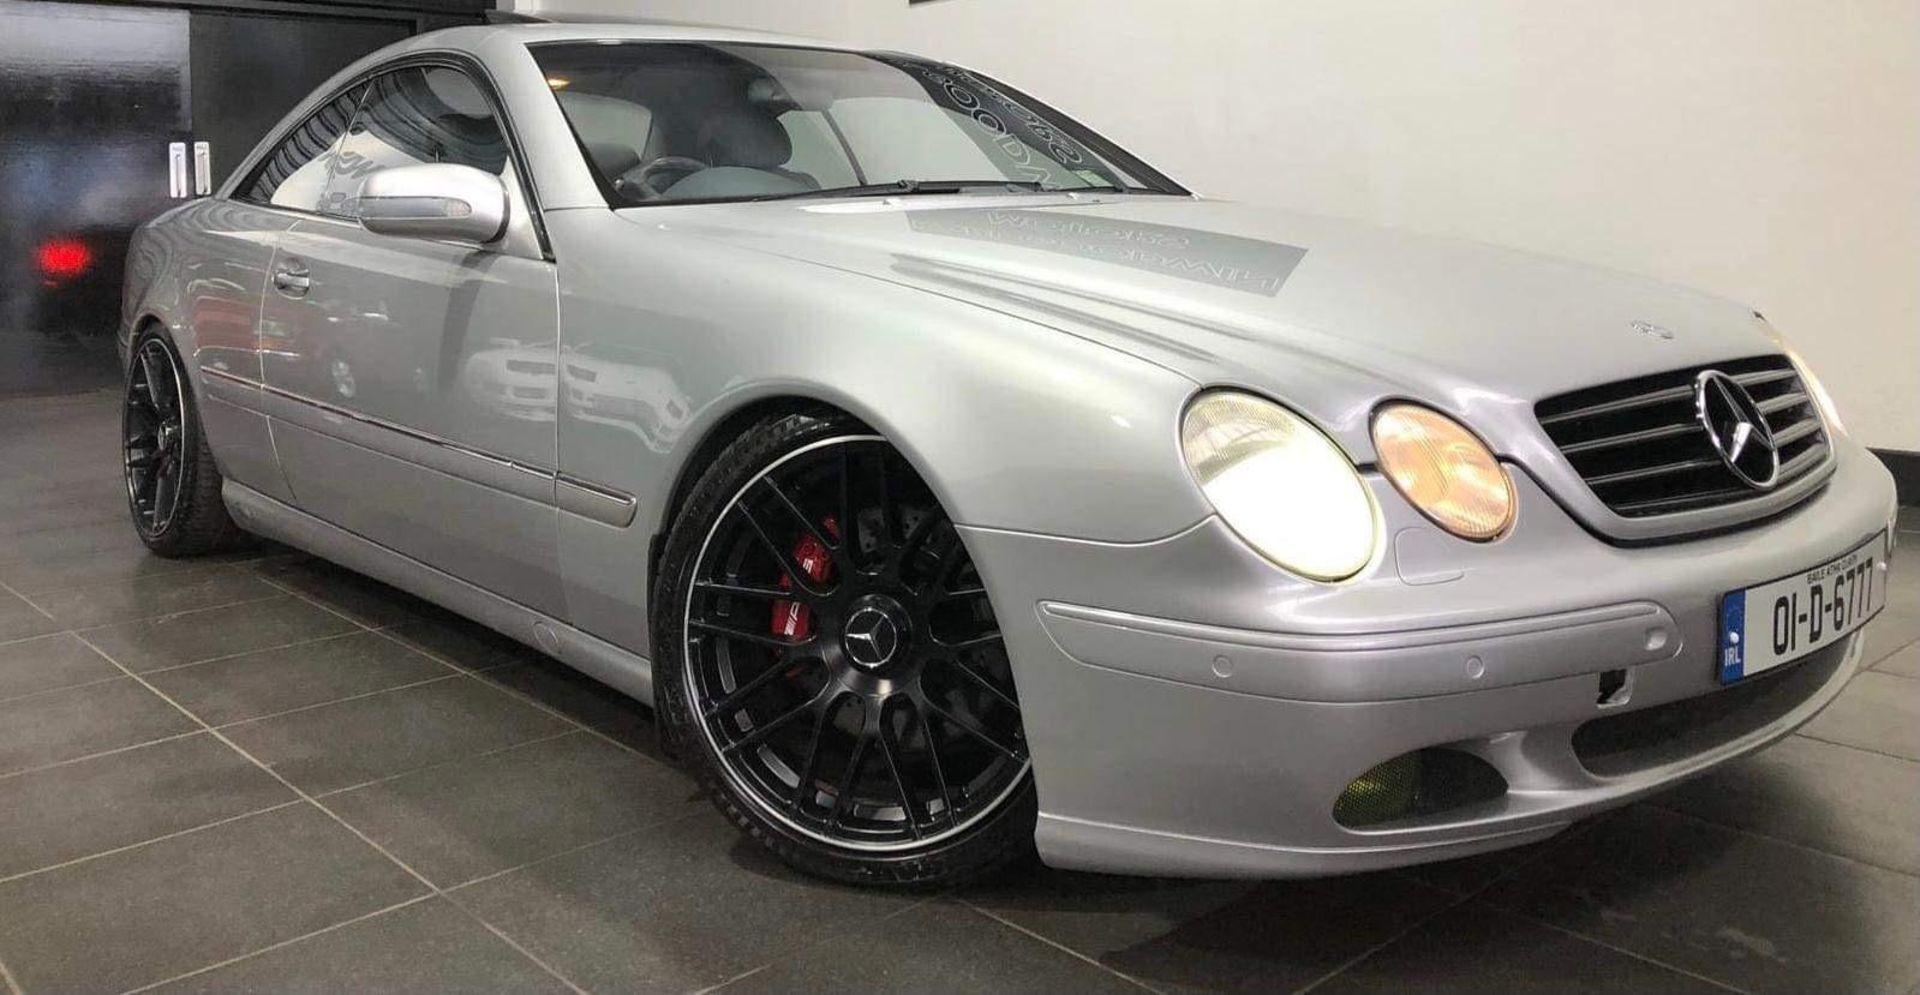 2001 Mercedes-Benz CL500 CLASS, SPORT, SOUTHERN REG, TOP SPEC, NO VAT - Image 2 of 10